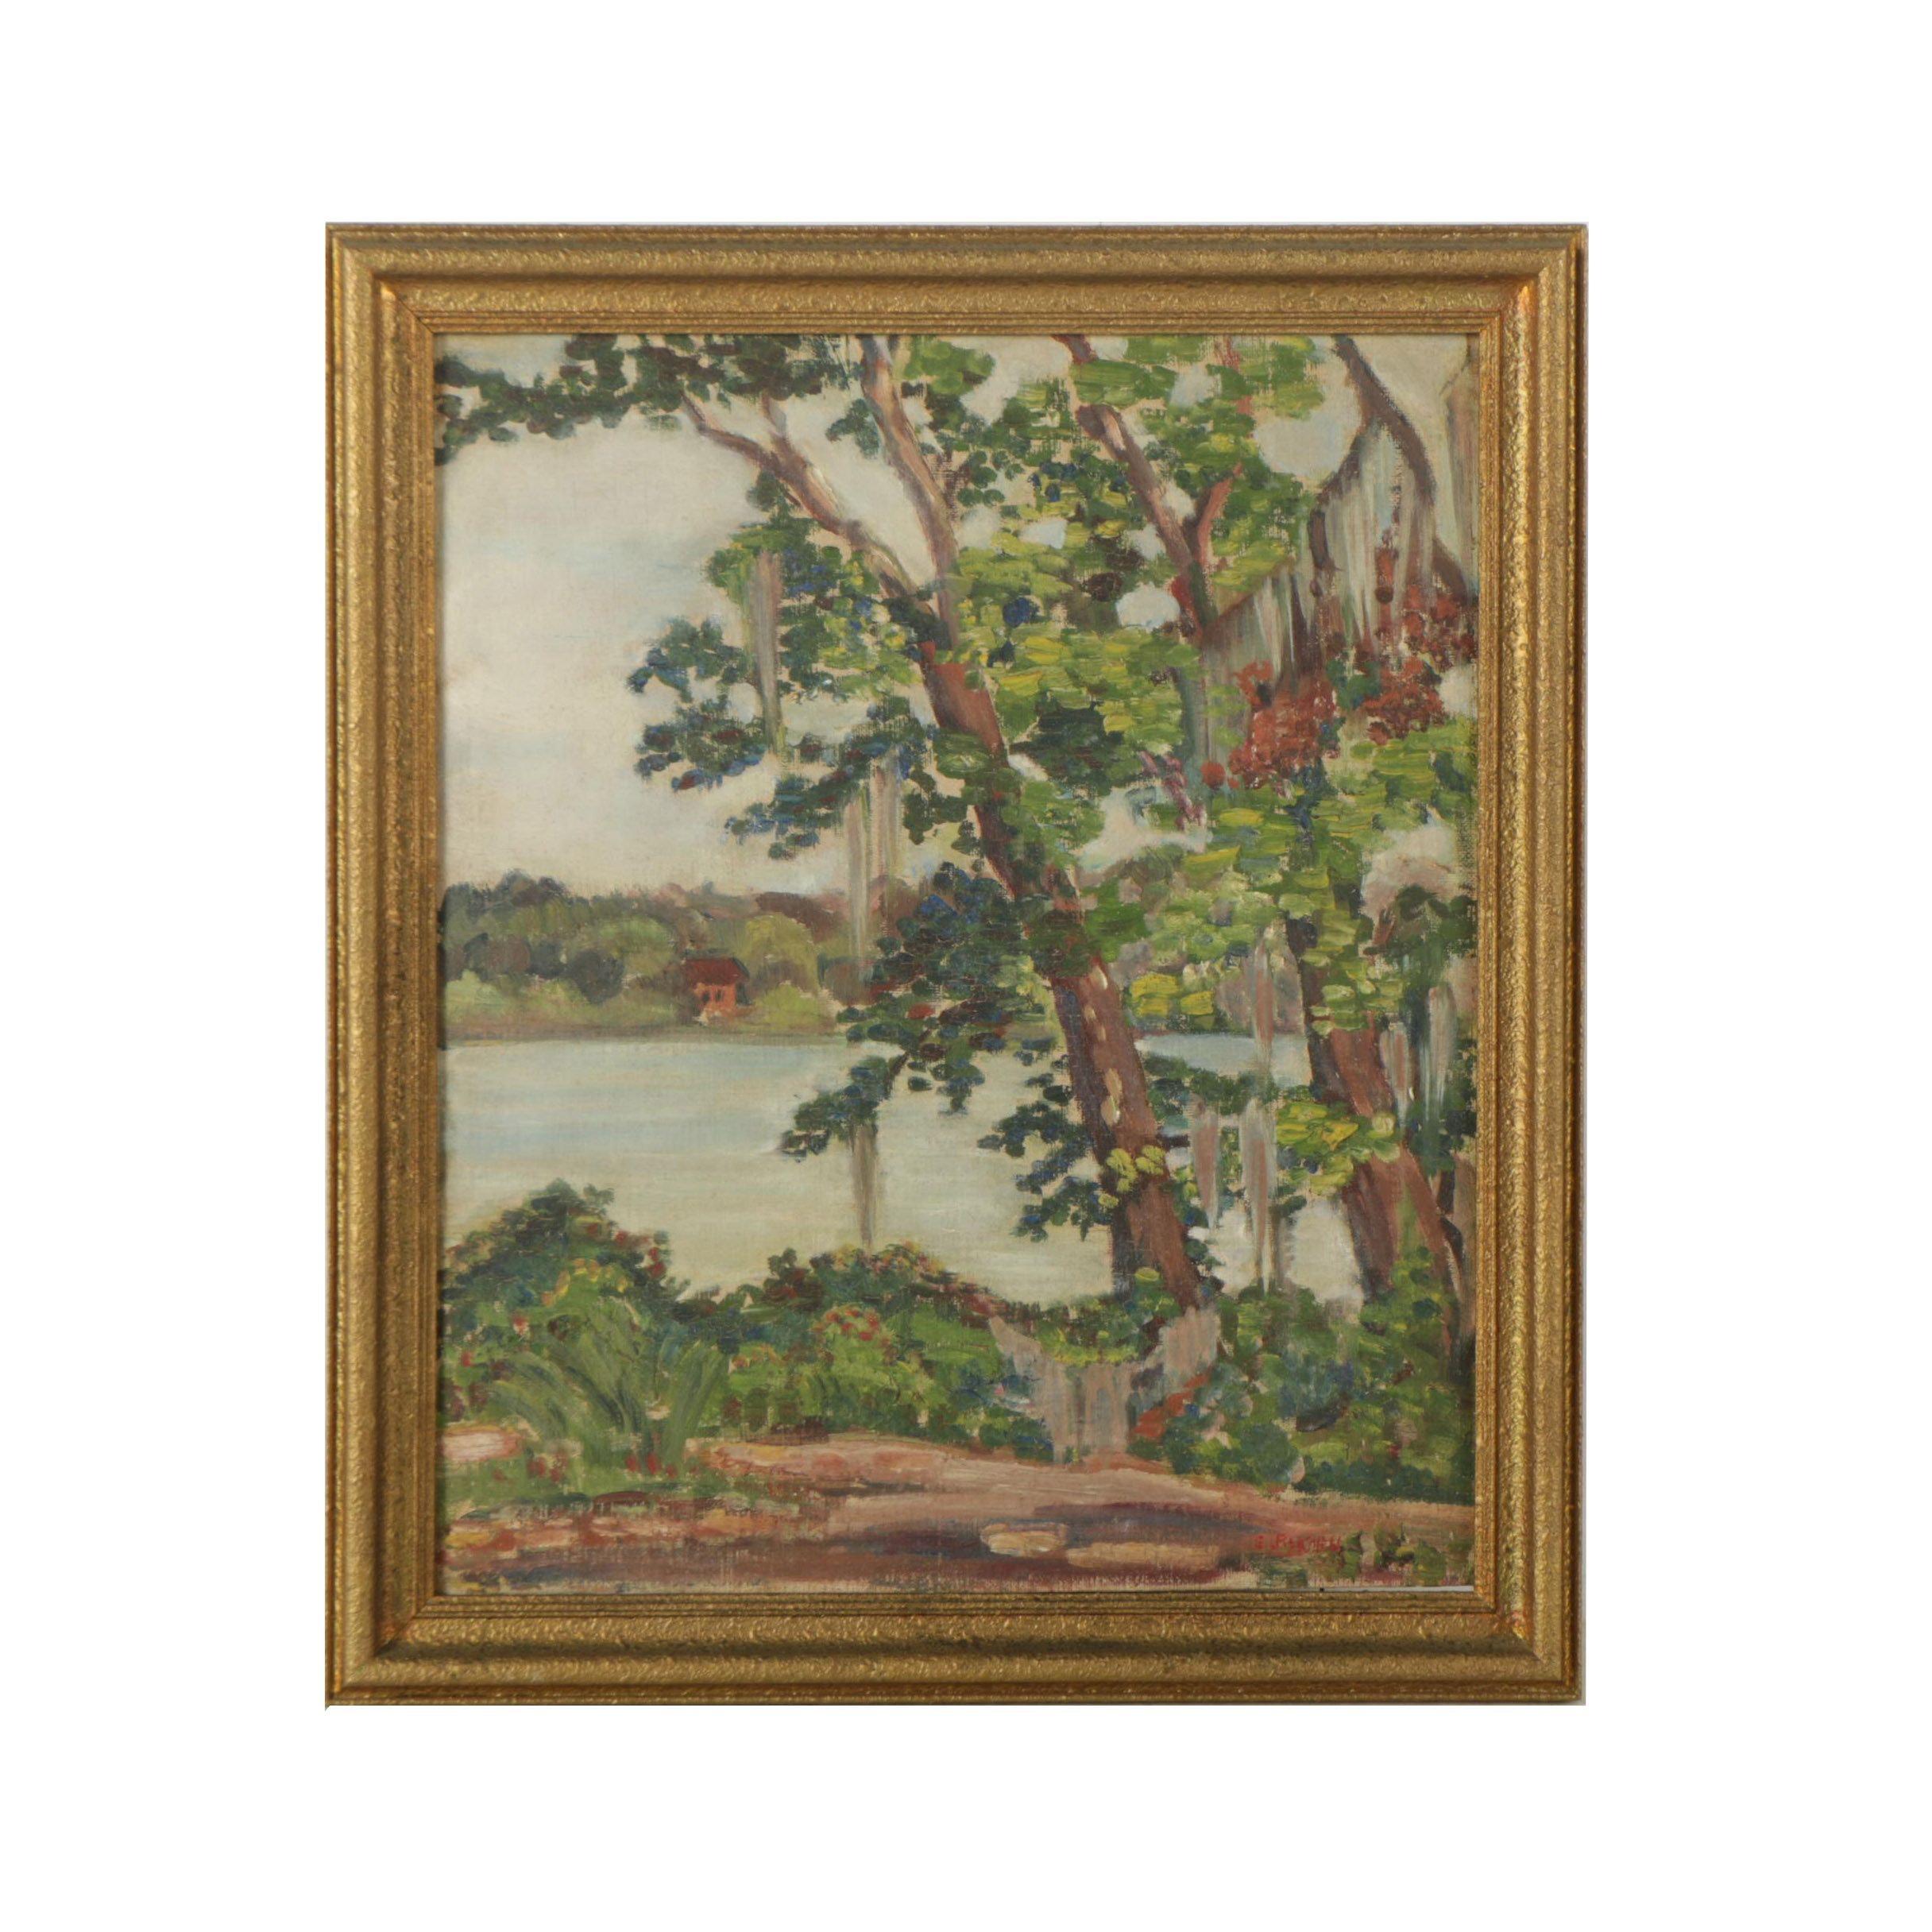 Elizabeth P. Korn Oil Painting on Canvas Board of Lake Scene